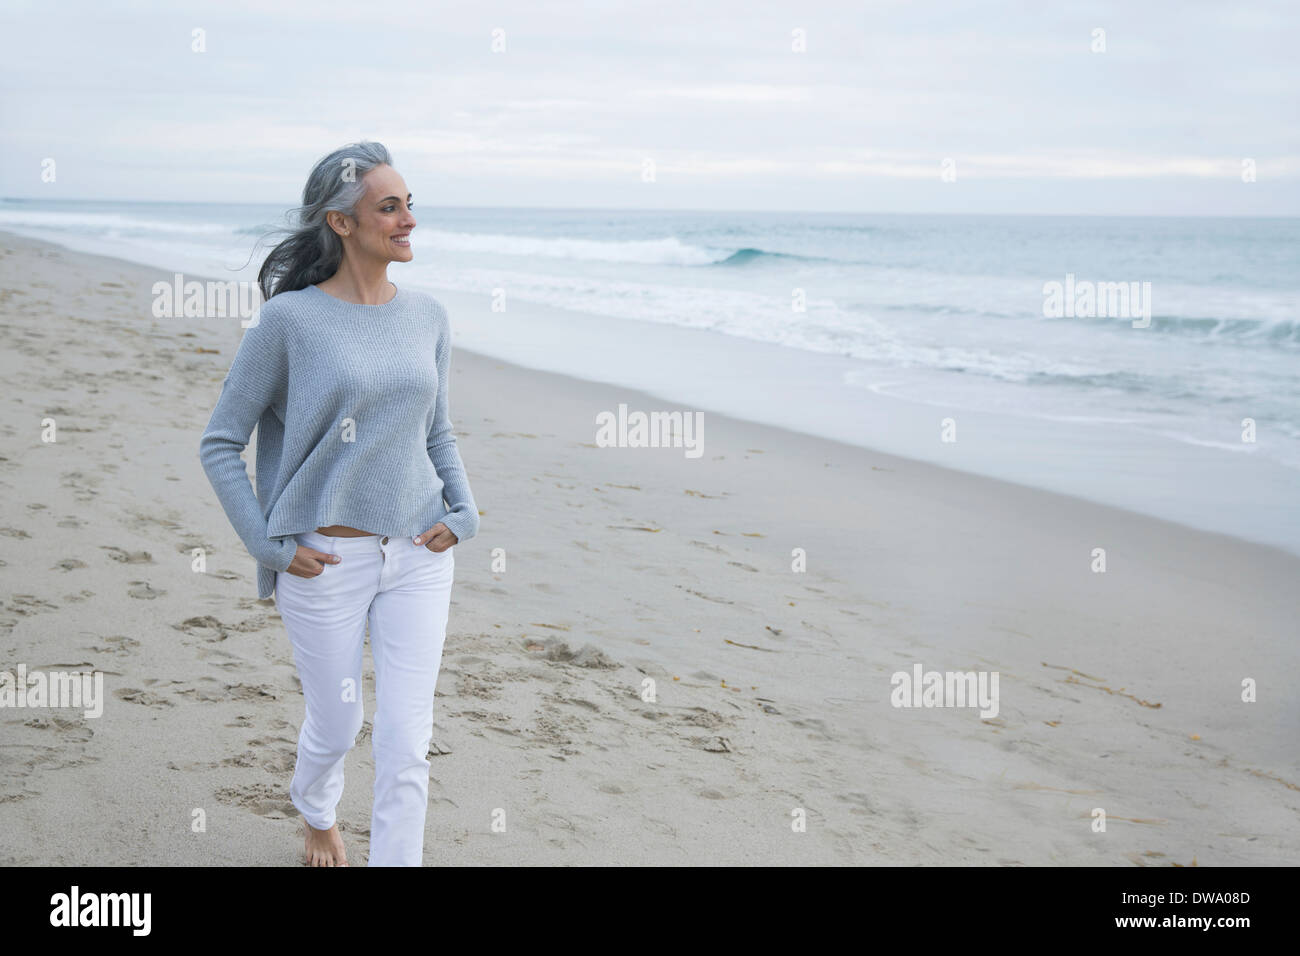 Mature woman walking on beach, Los Angeles, California, USA - Stock Image